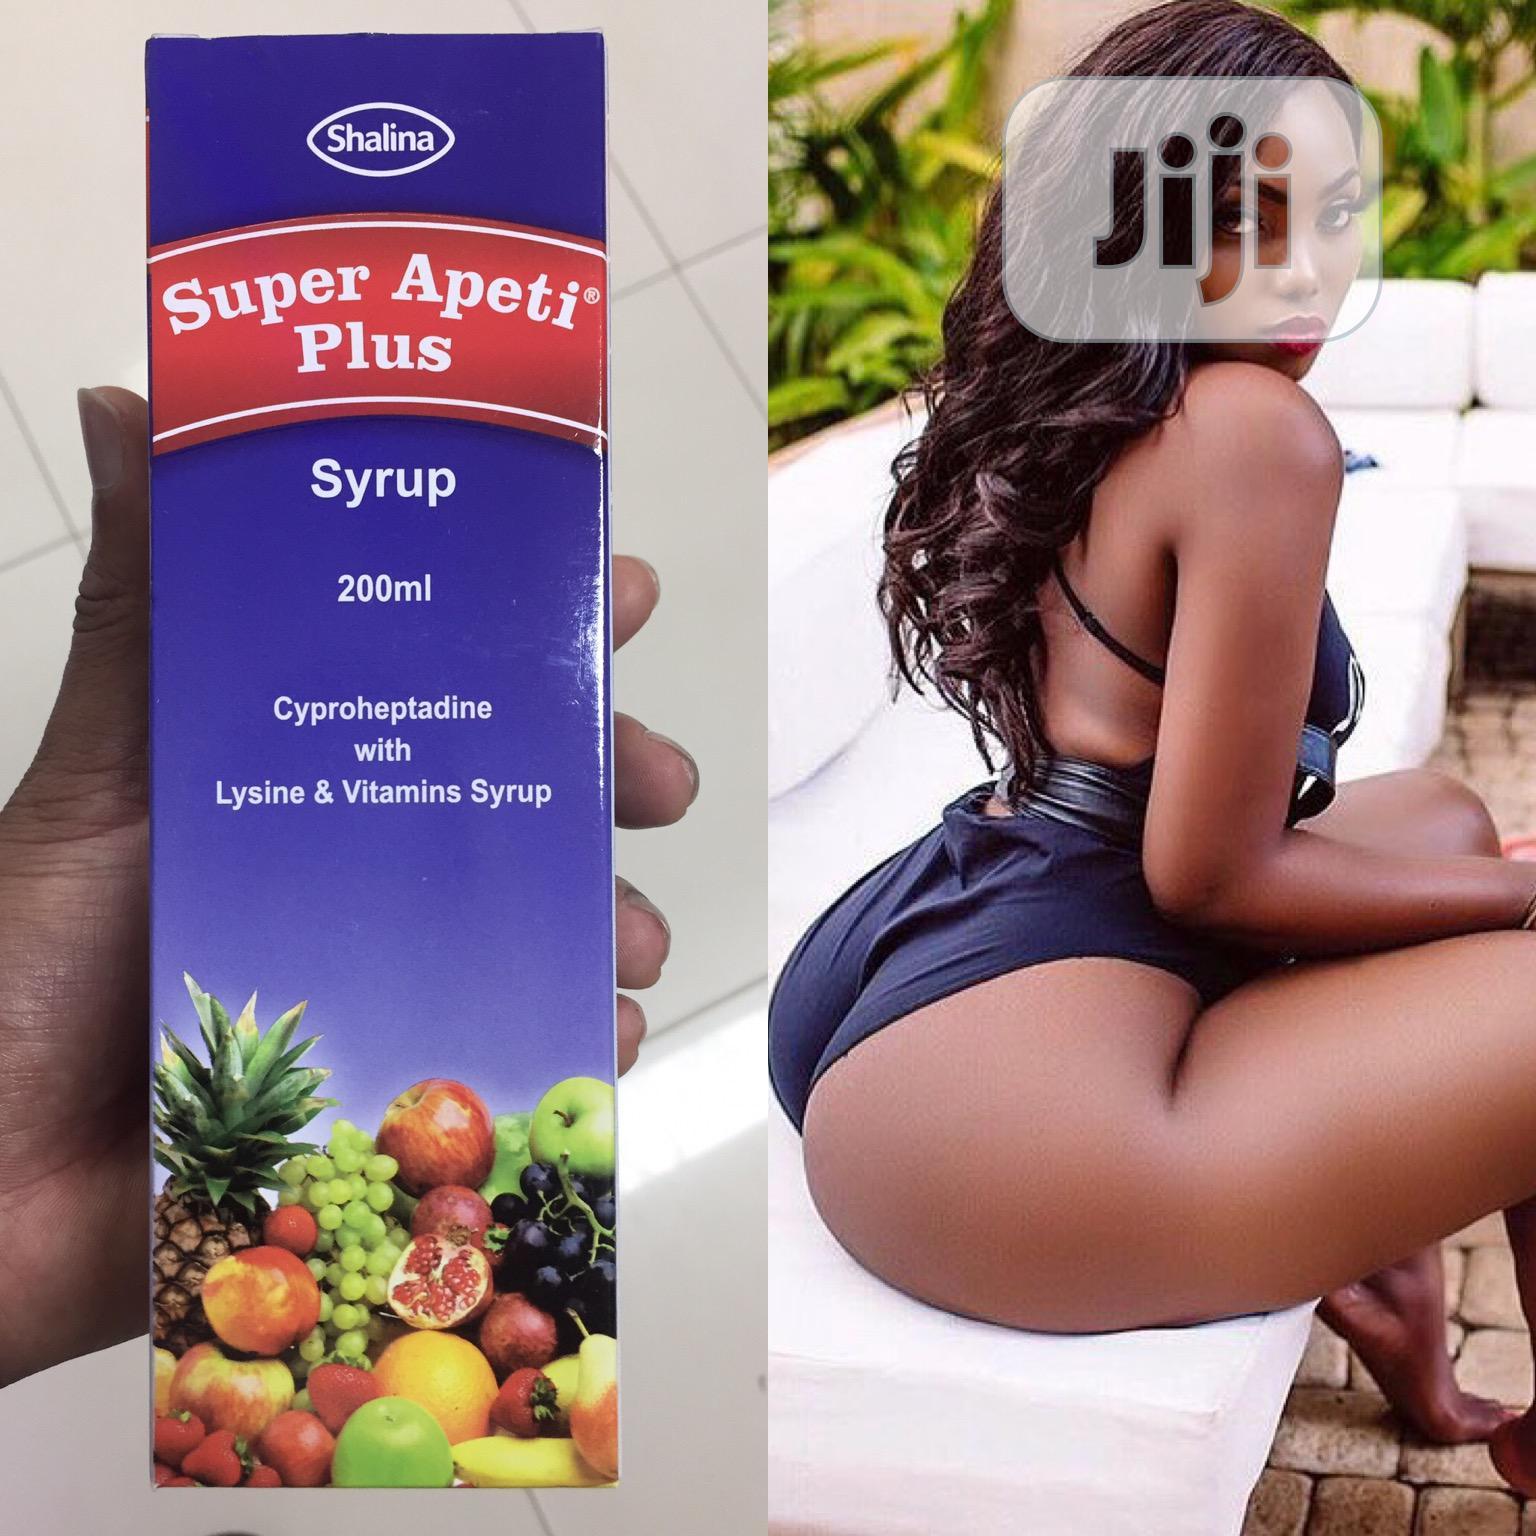 Apeti Plus - Effective Boobs, Hips & Butt Enlargement Vitamin Syrup